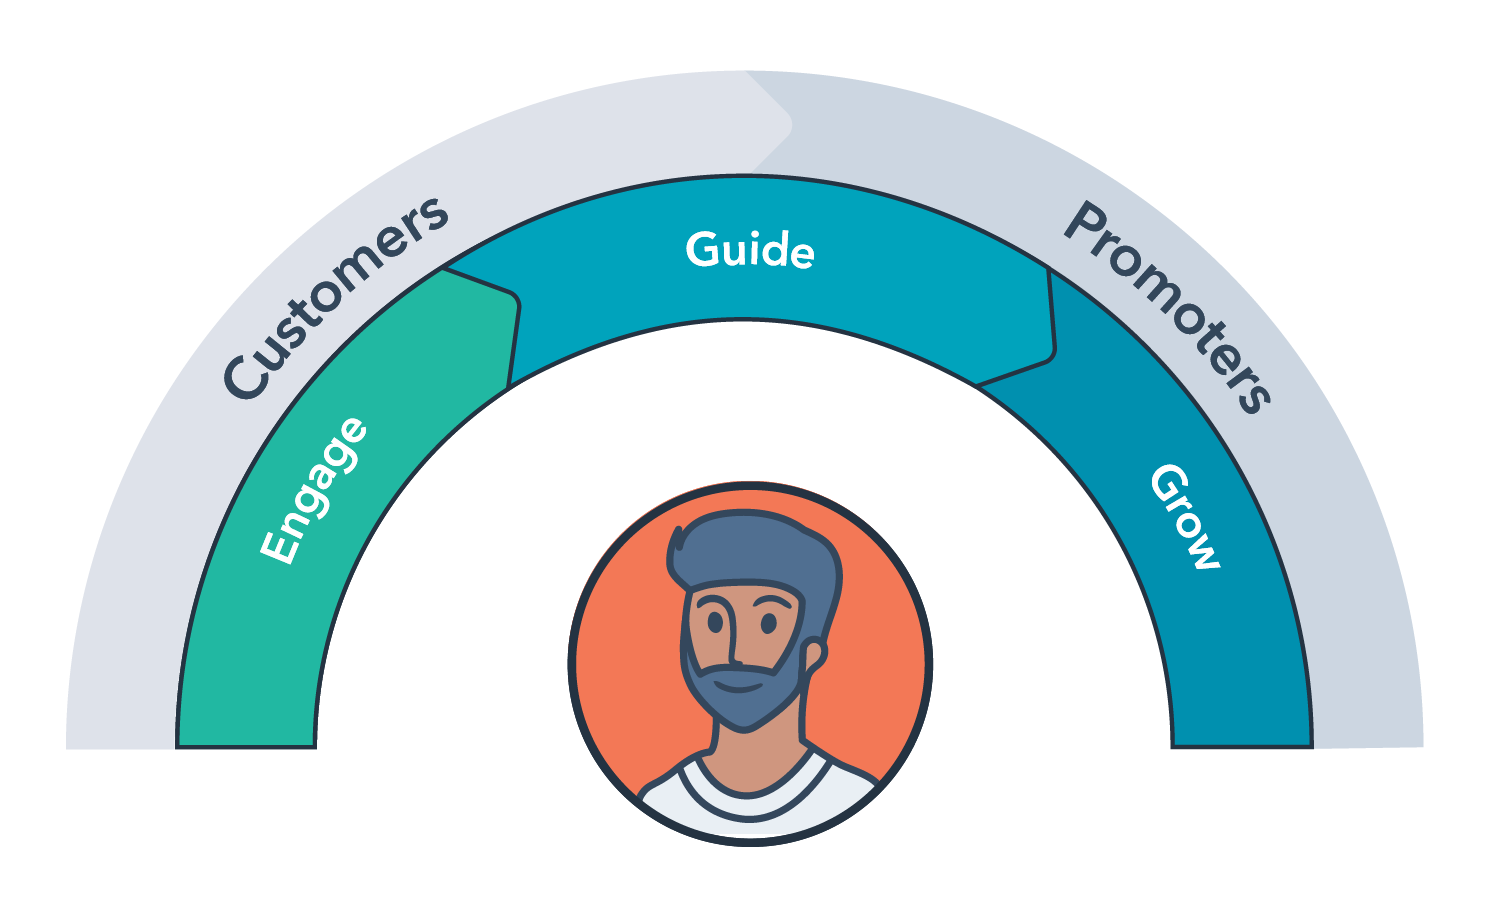 services-framework-1-1